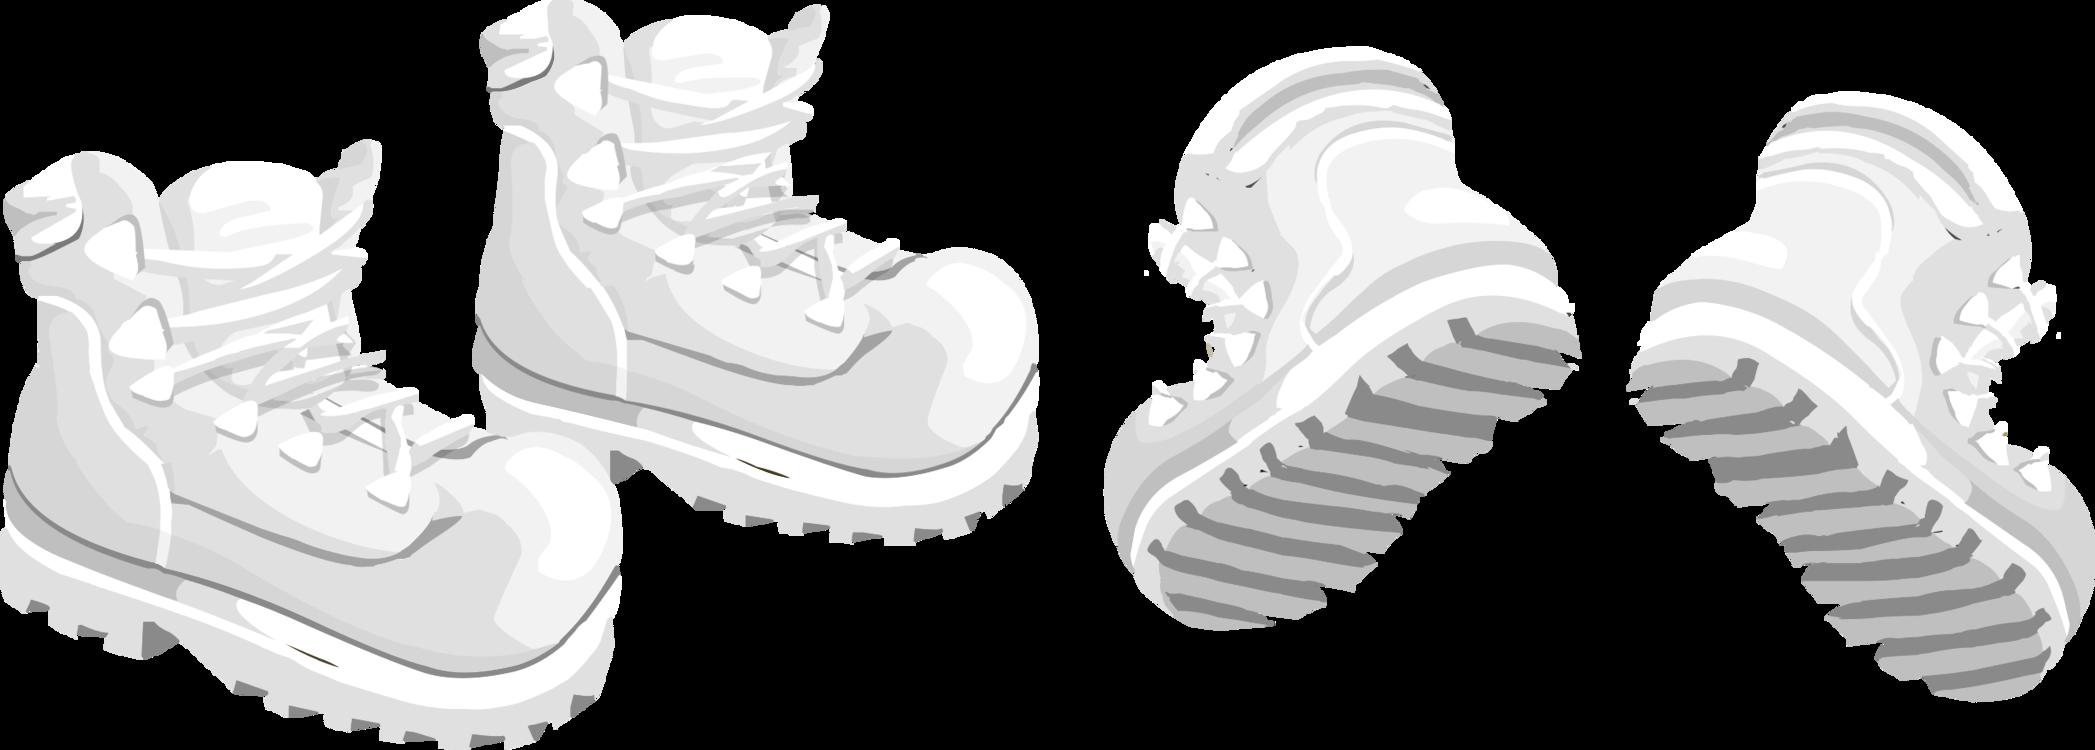 Walking Shoe,Outdoor Shoe,Sneakers